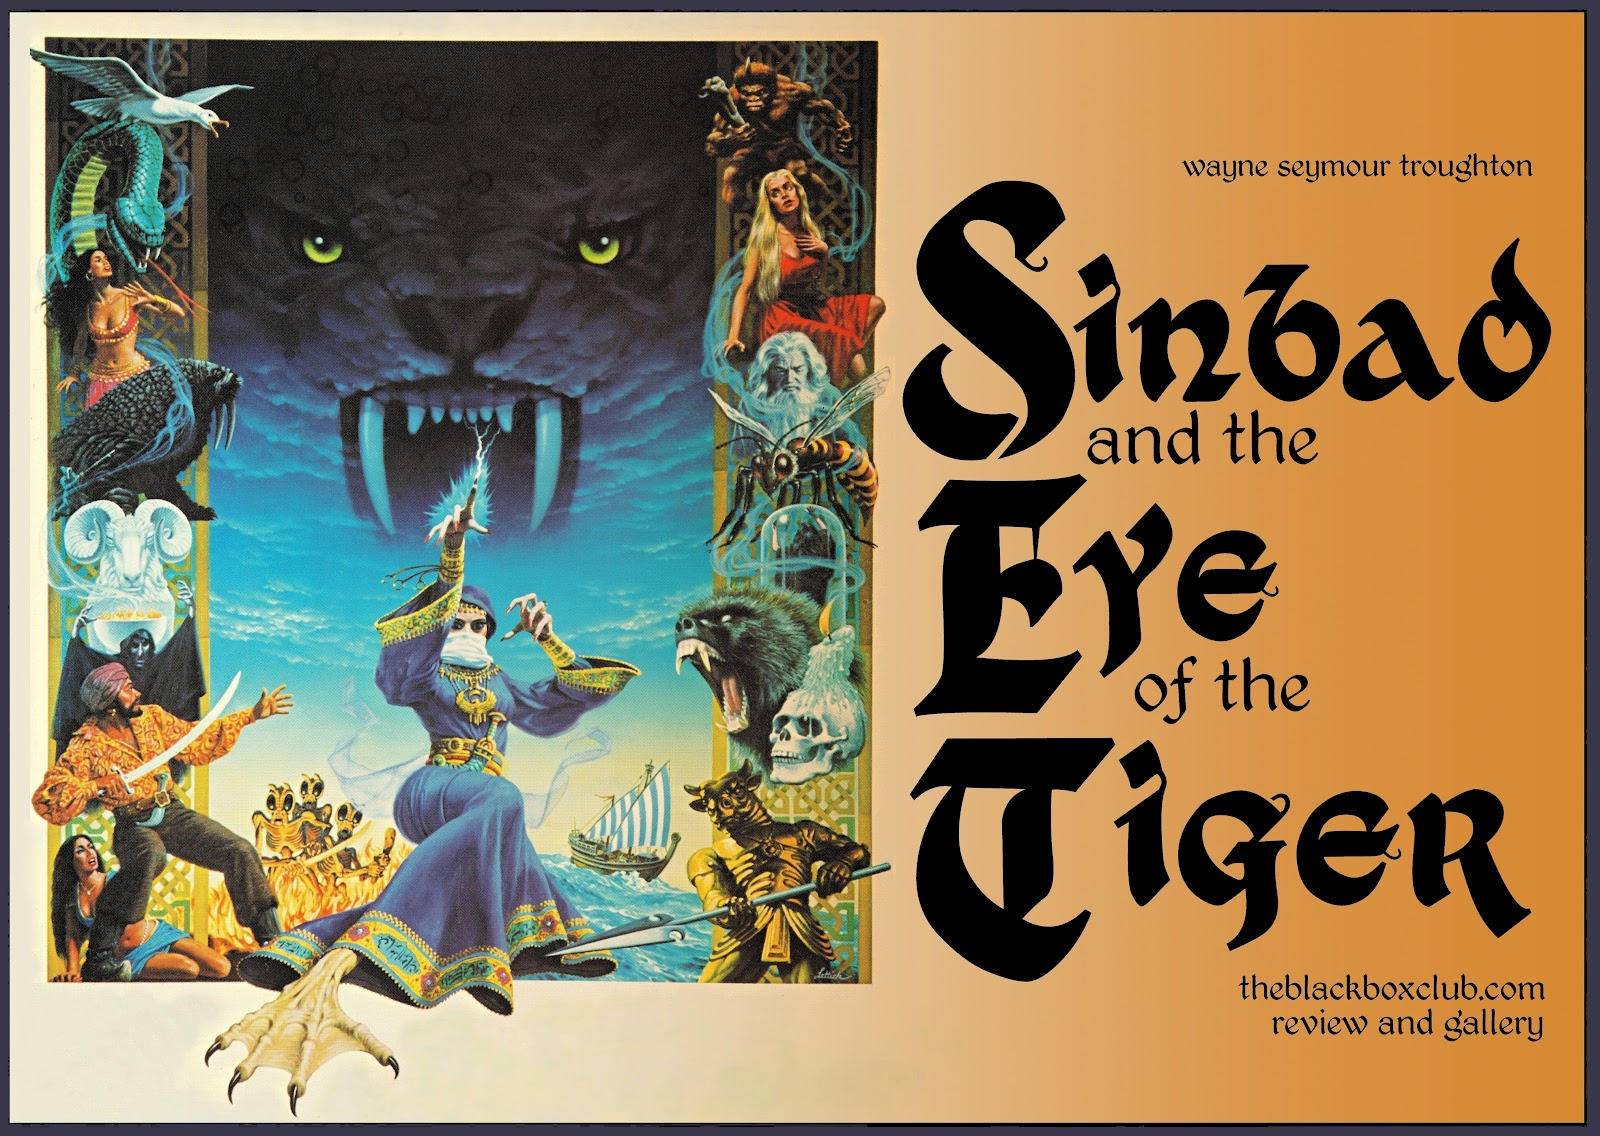 http://3.bp.blogspot.com/-JNmzeeHNEtE/UBY0vxNk_MI/AAAAAAAAIr8/mVfI0voTmpY/s1600/SINBAD+eye+of+tiger+d442.jpg